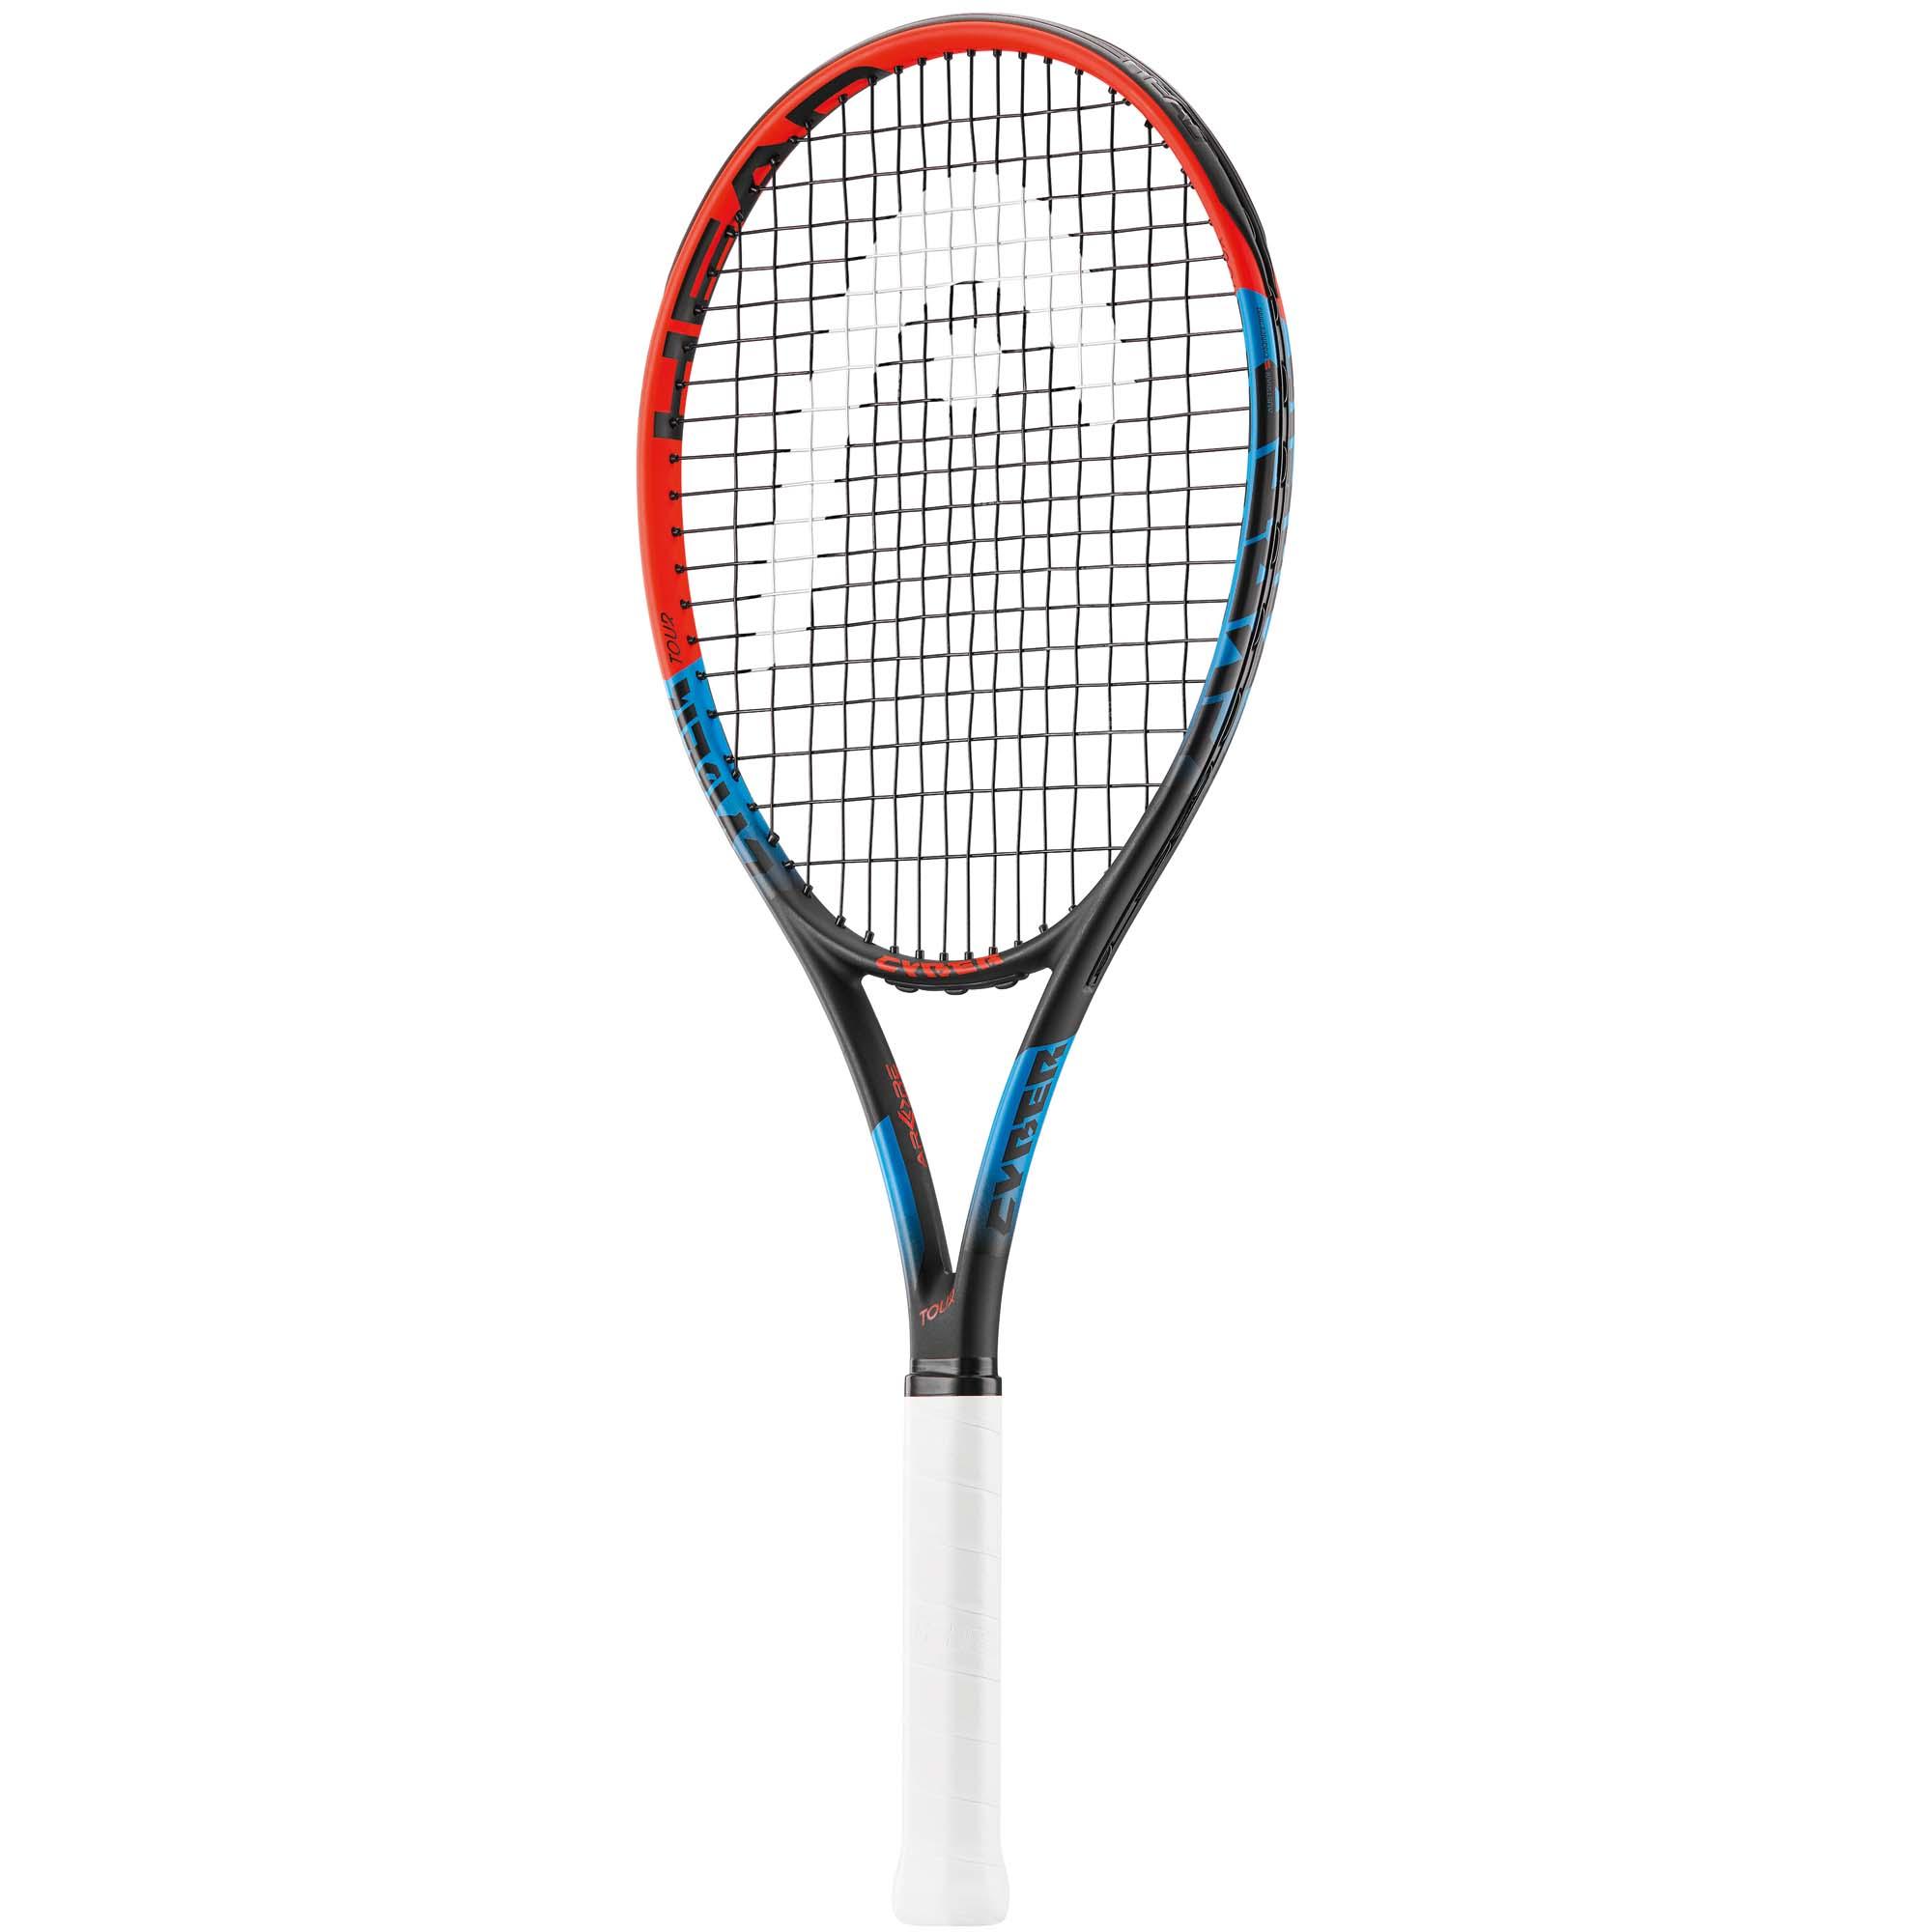 Head MX Cyber Tour Tennis Racket  Grip 1